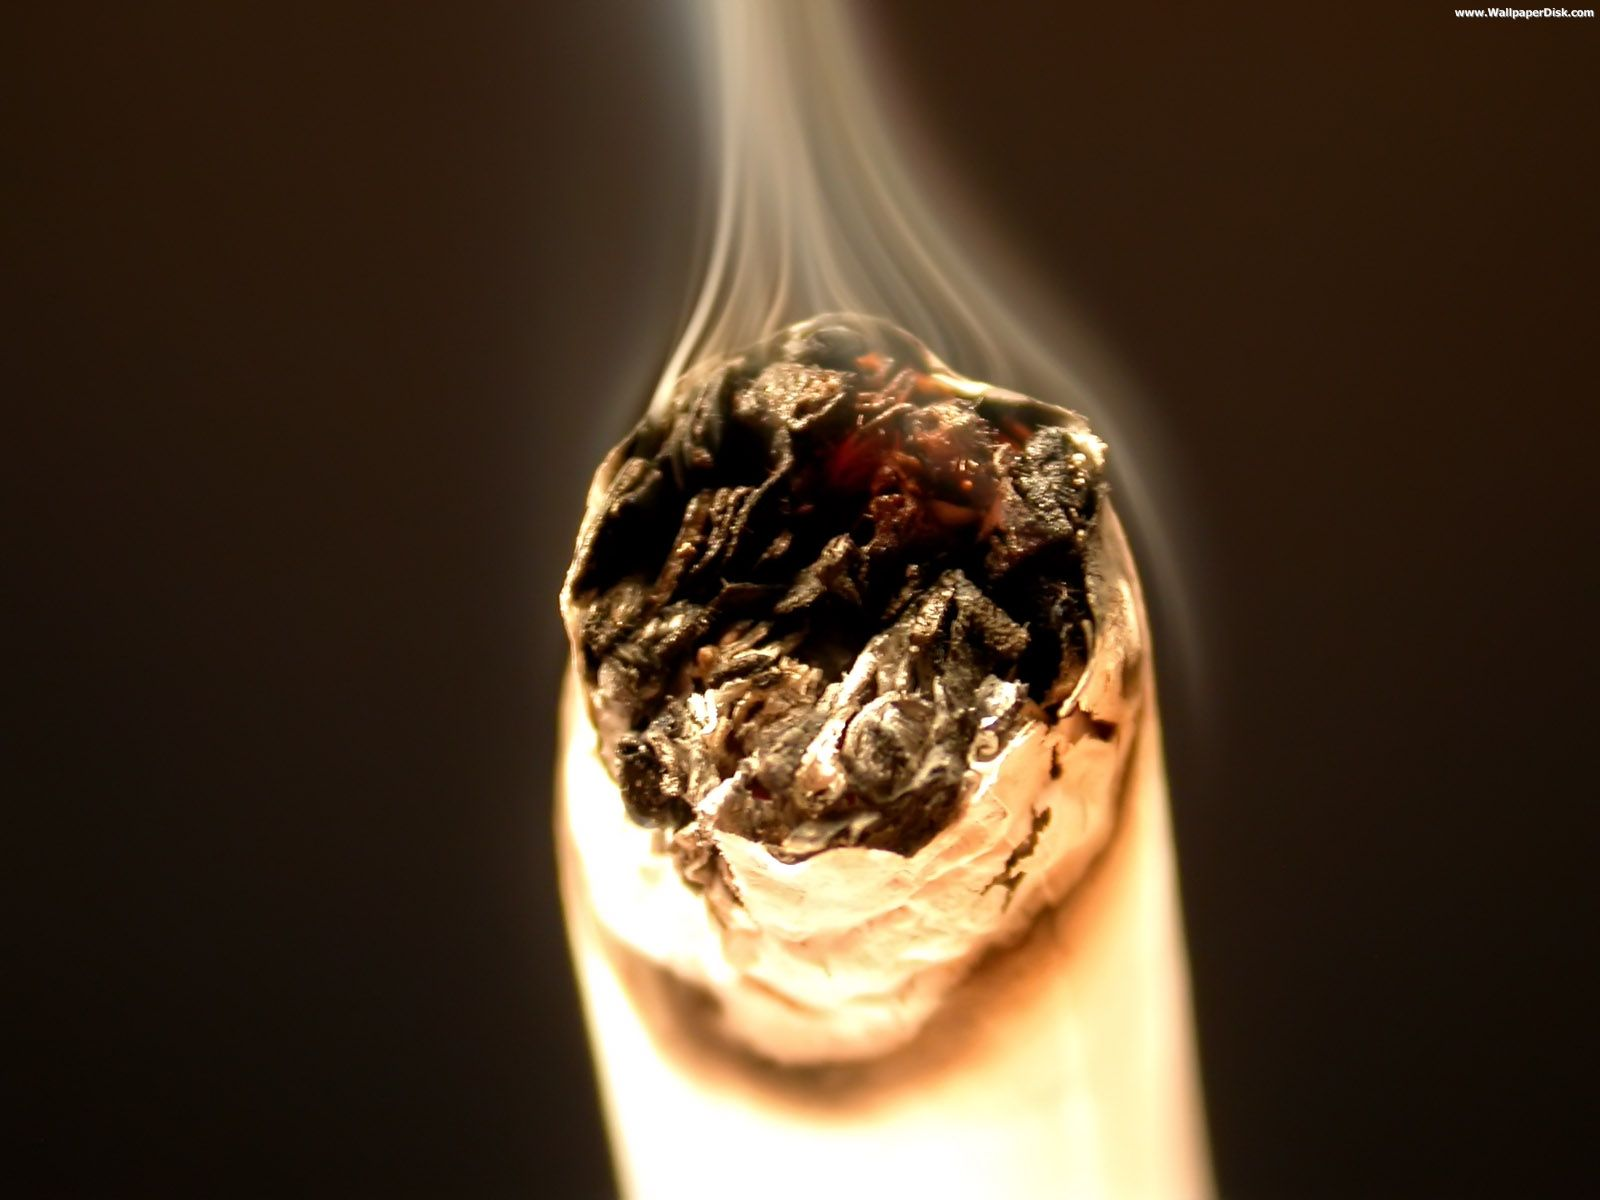 Buy Fortuna cigarettes Milwaukee